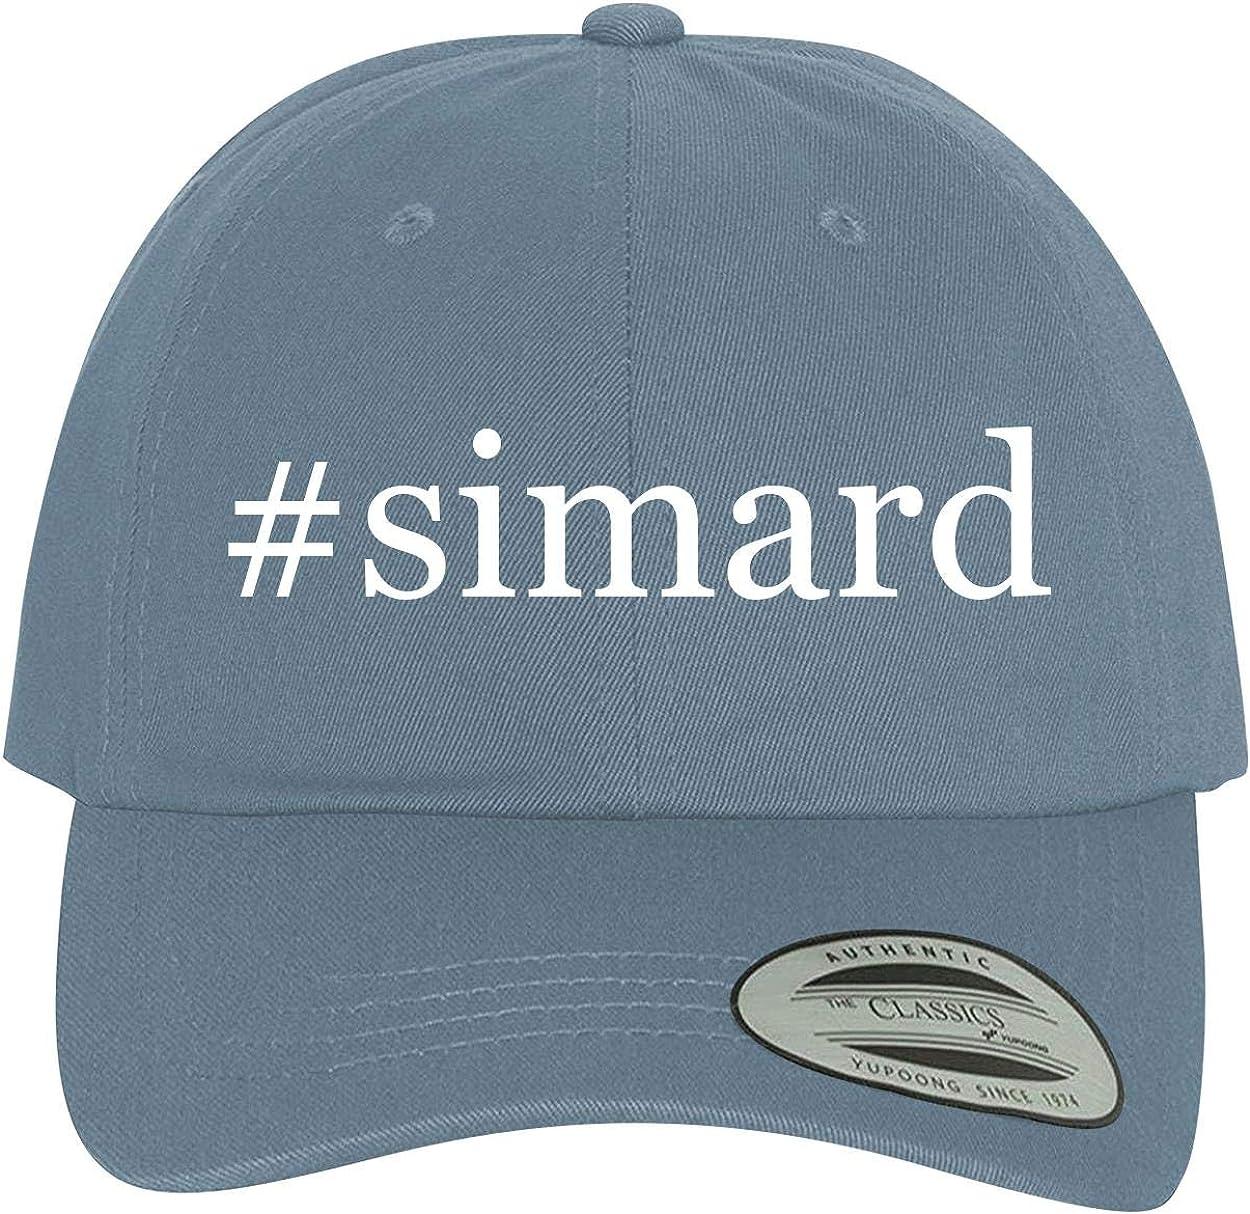 Comfortable Dad Hat Baseball Cap BH Cool Designs #Simard